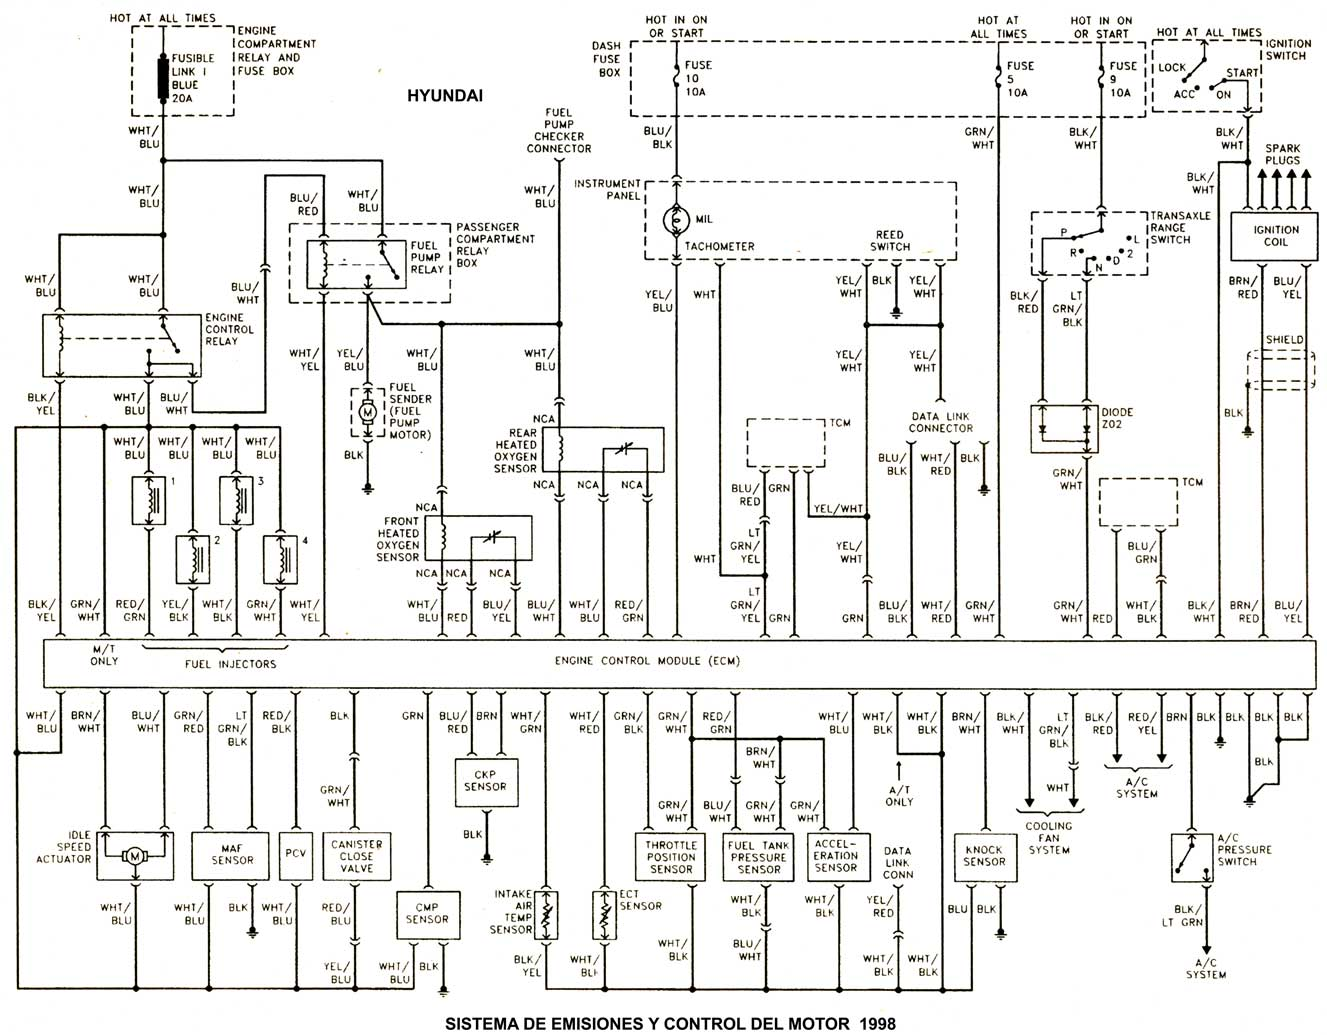 2001 hyundai accent ecu wiring diagram telephone socket bt 1986/97 | diagramas esquemas ubicacion de components mecanica automotriz